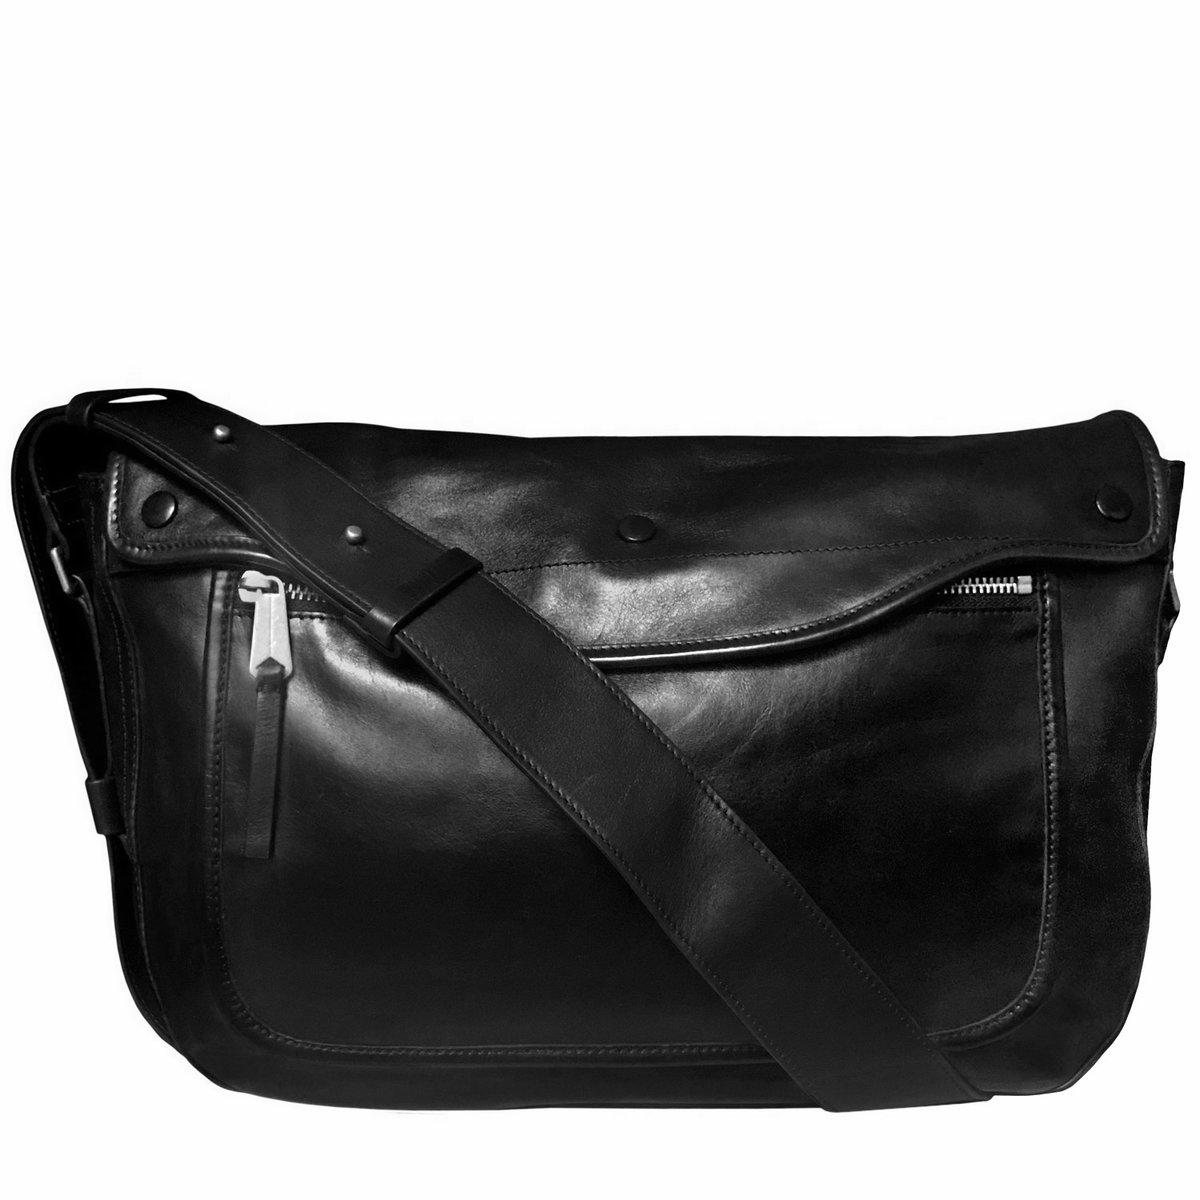 Paul Smith black leather messenger crossbody bag.jpg